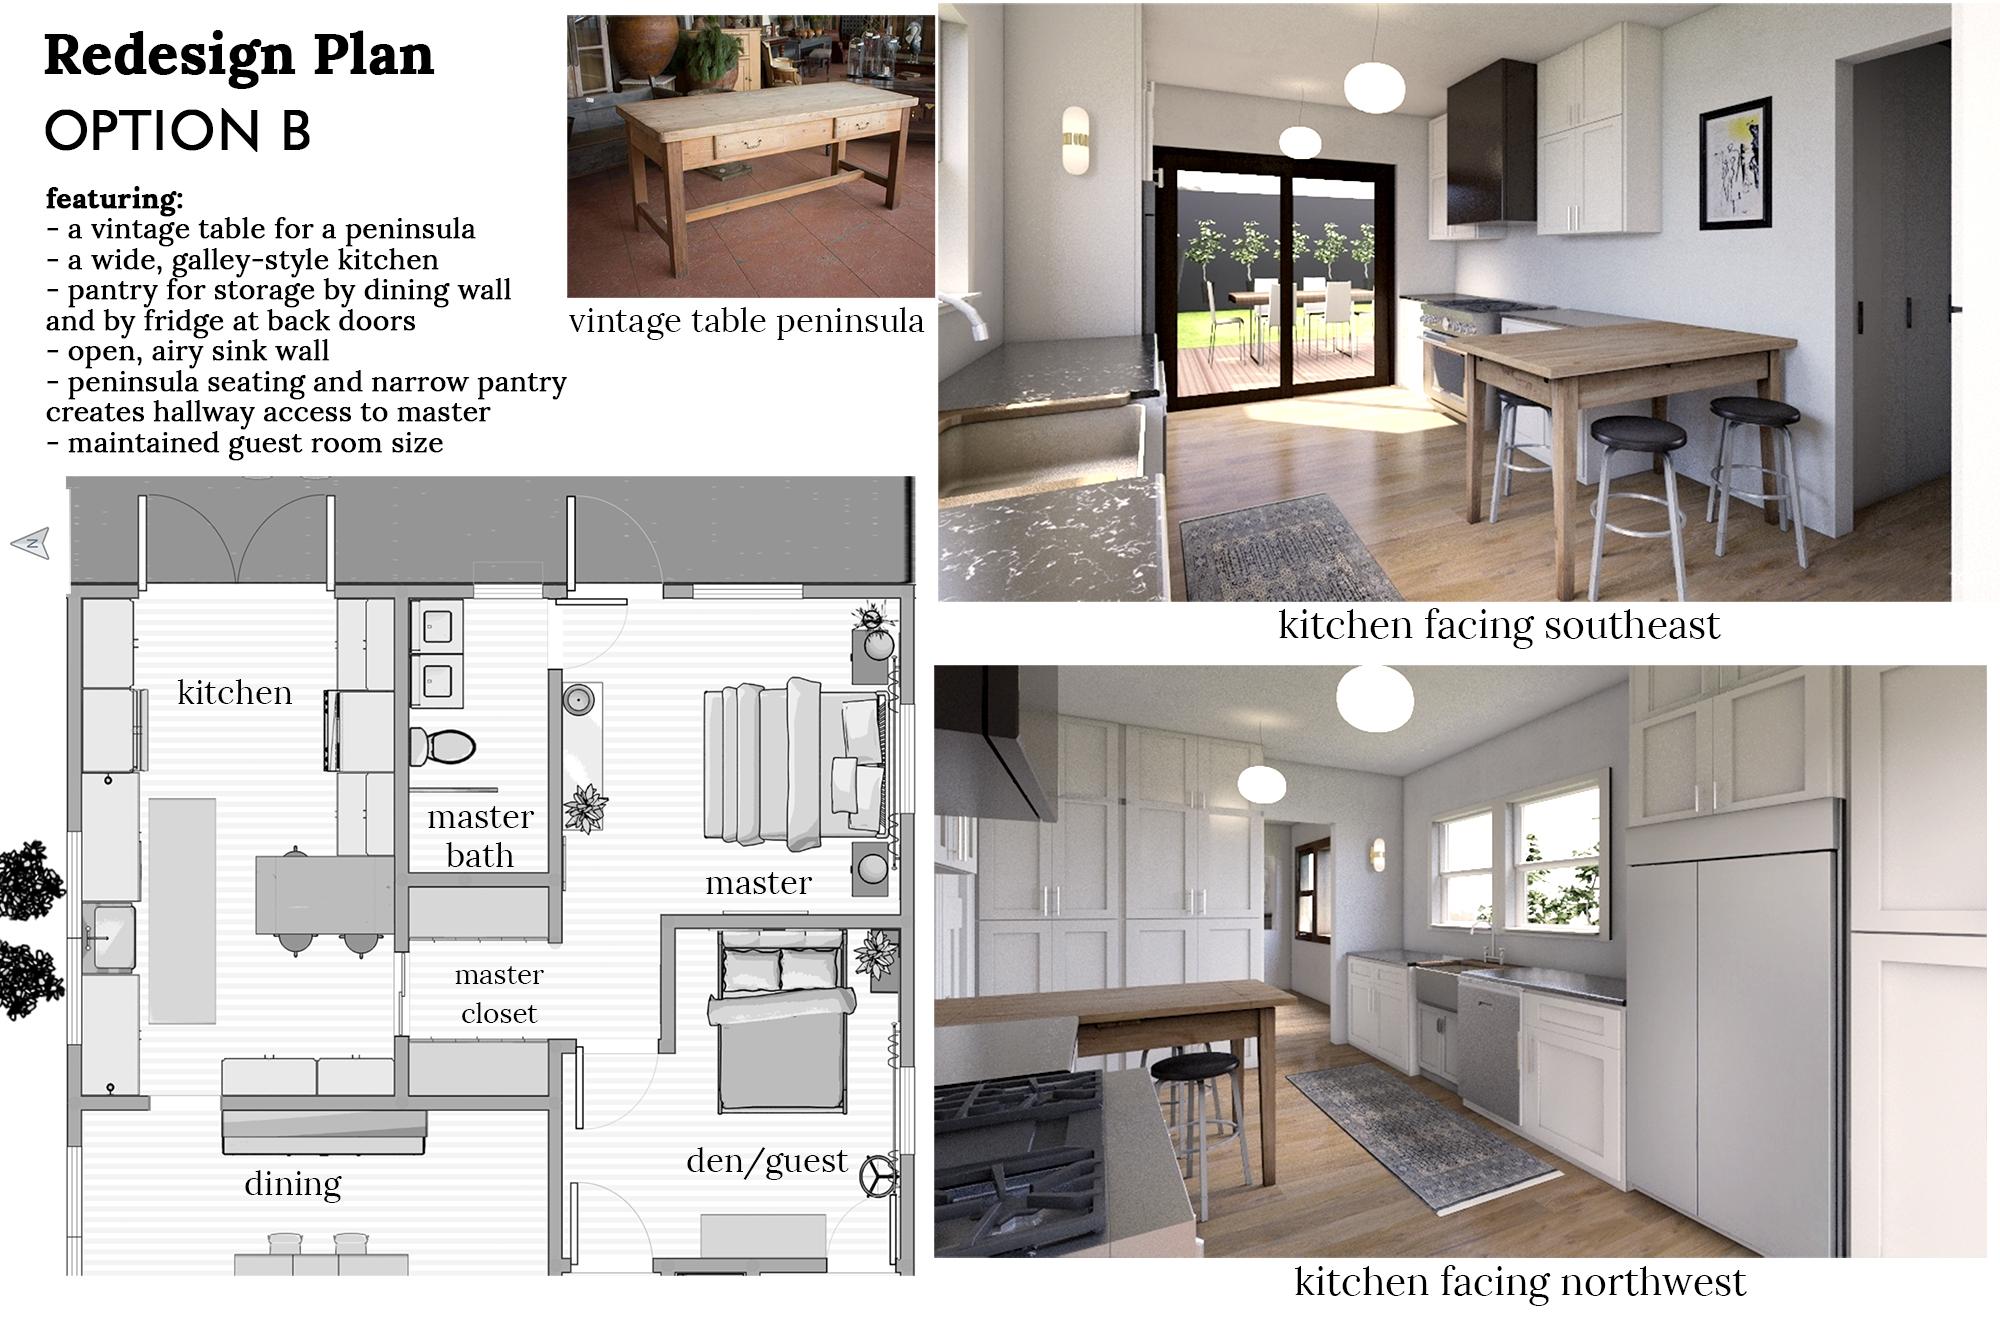 Redesign Plan Option B.jpg